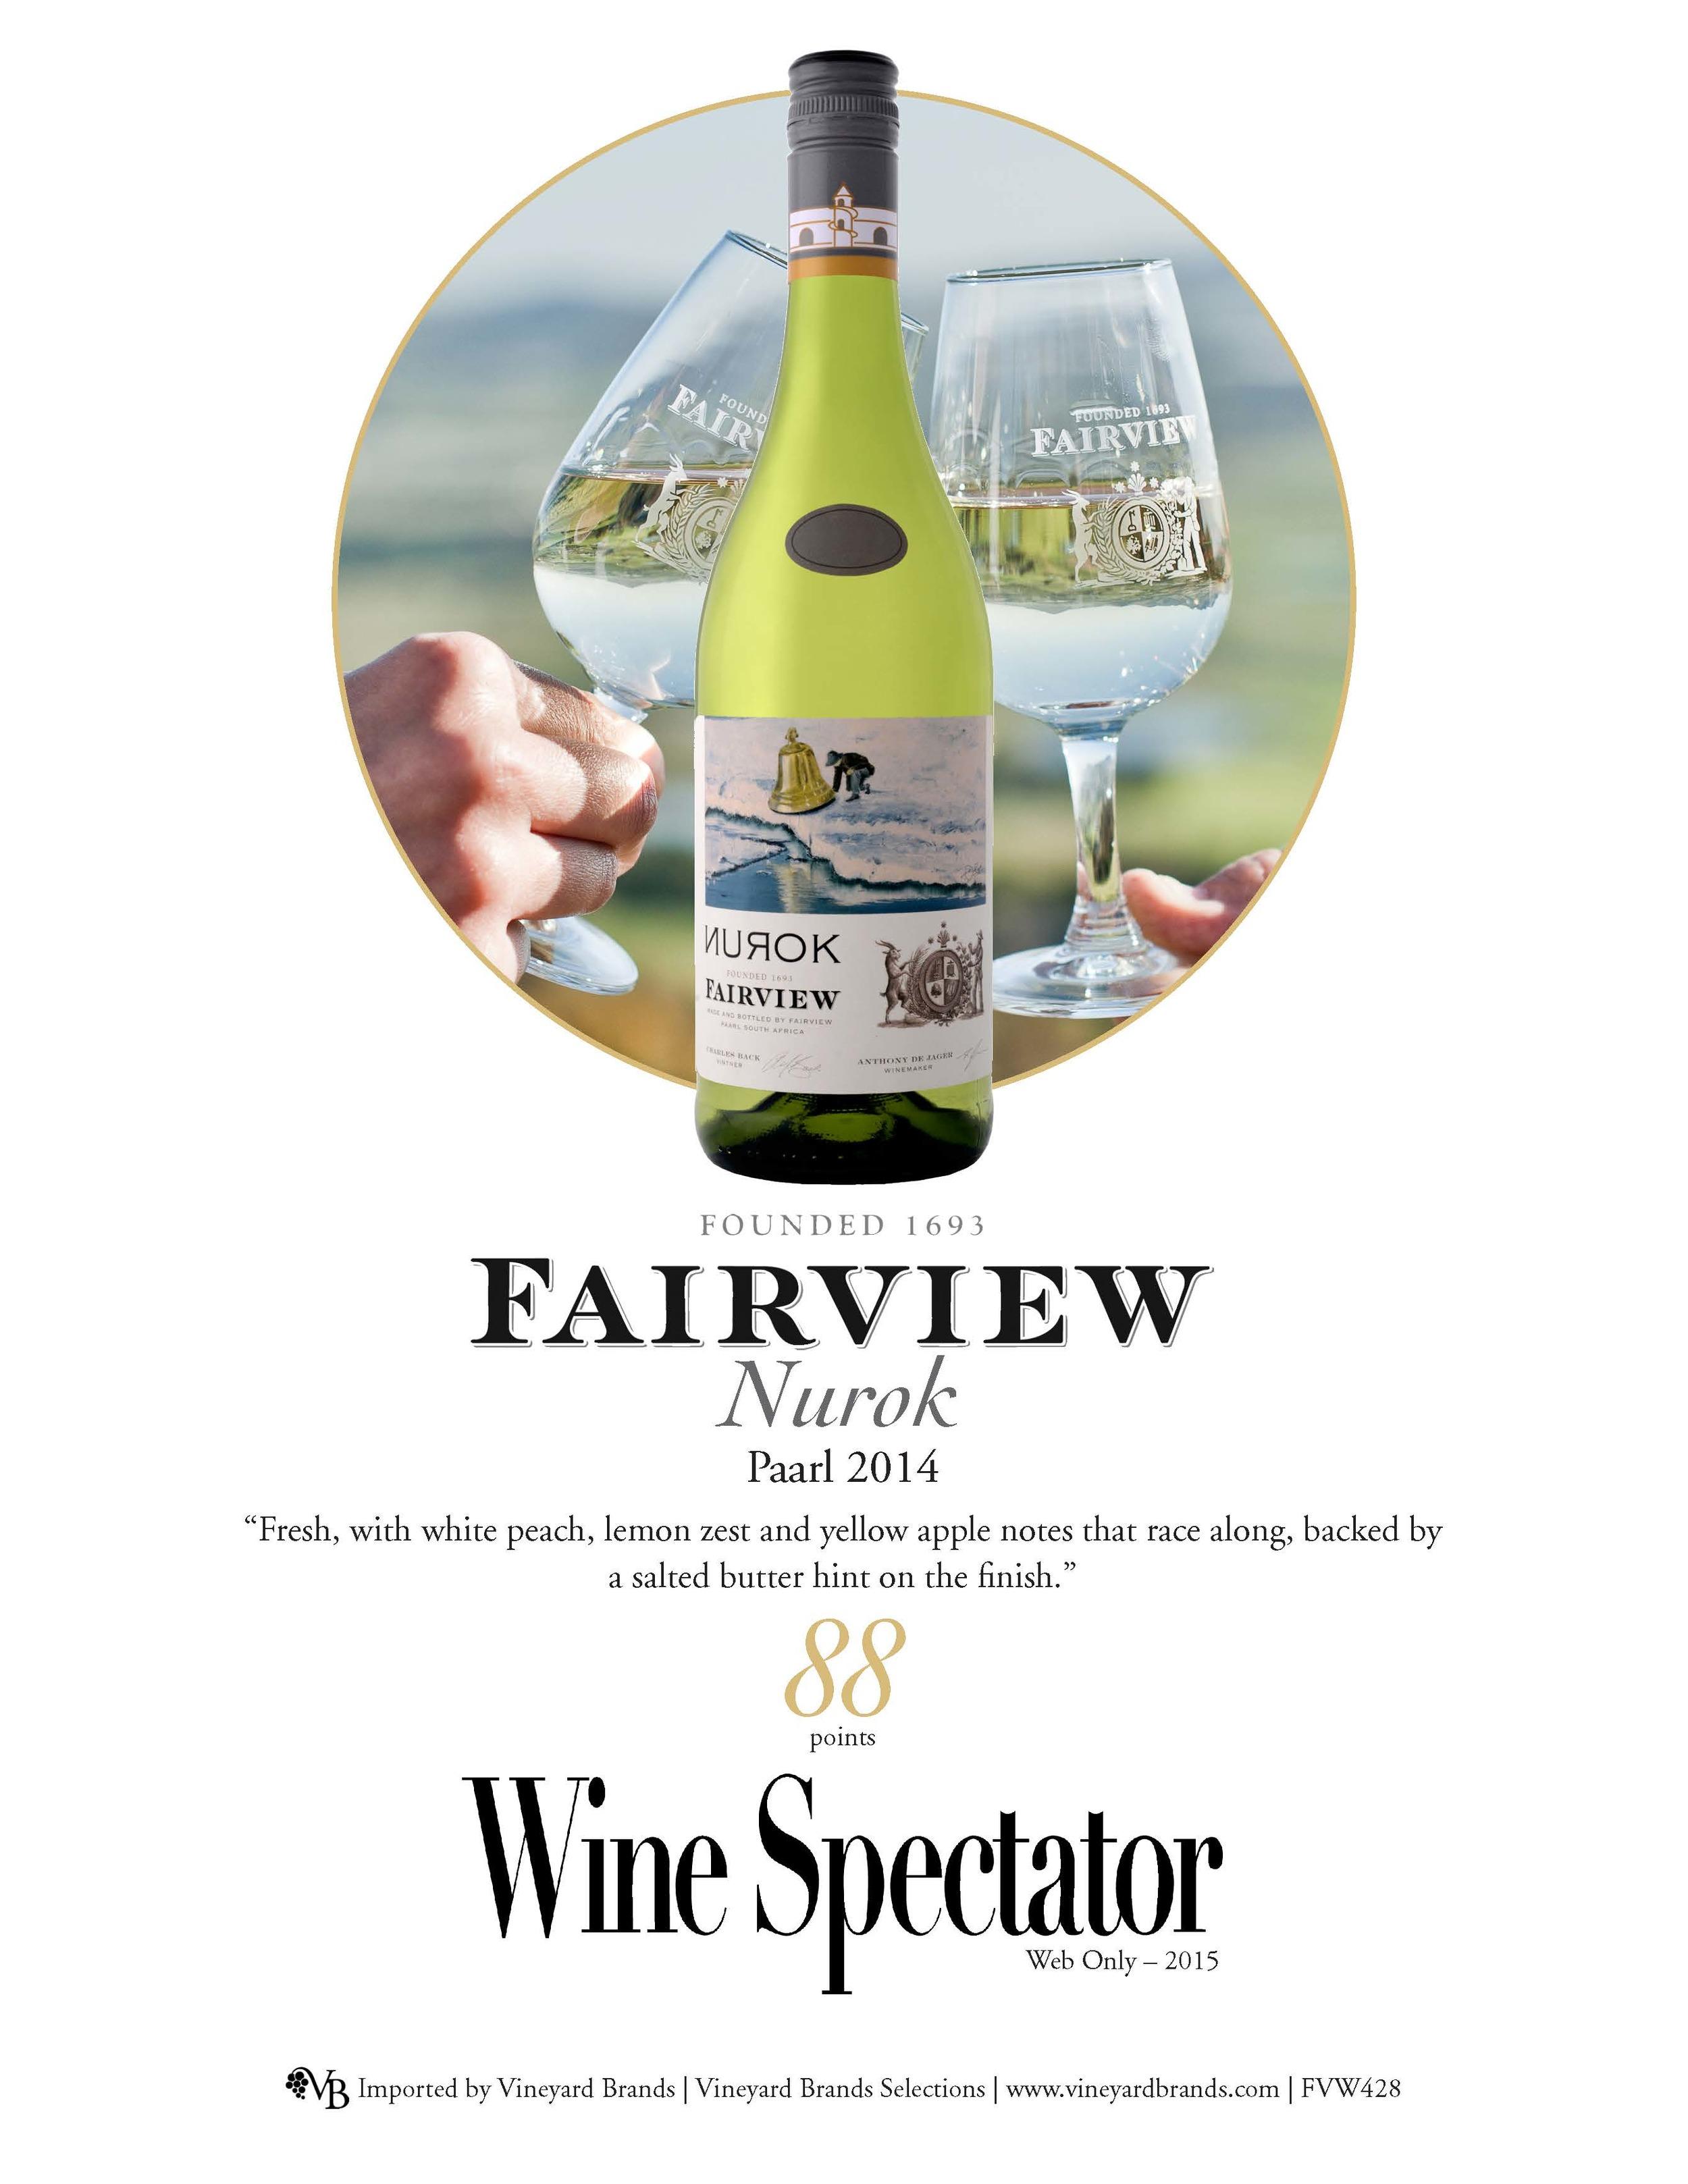 Fairview Nurok Paarl 2014